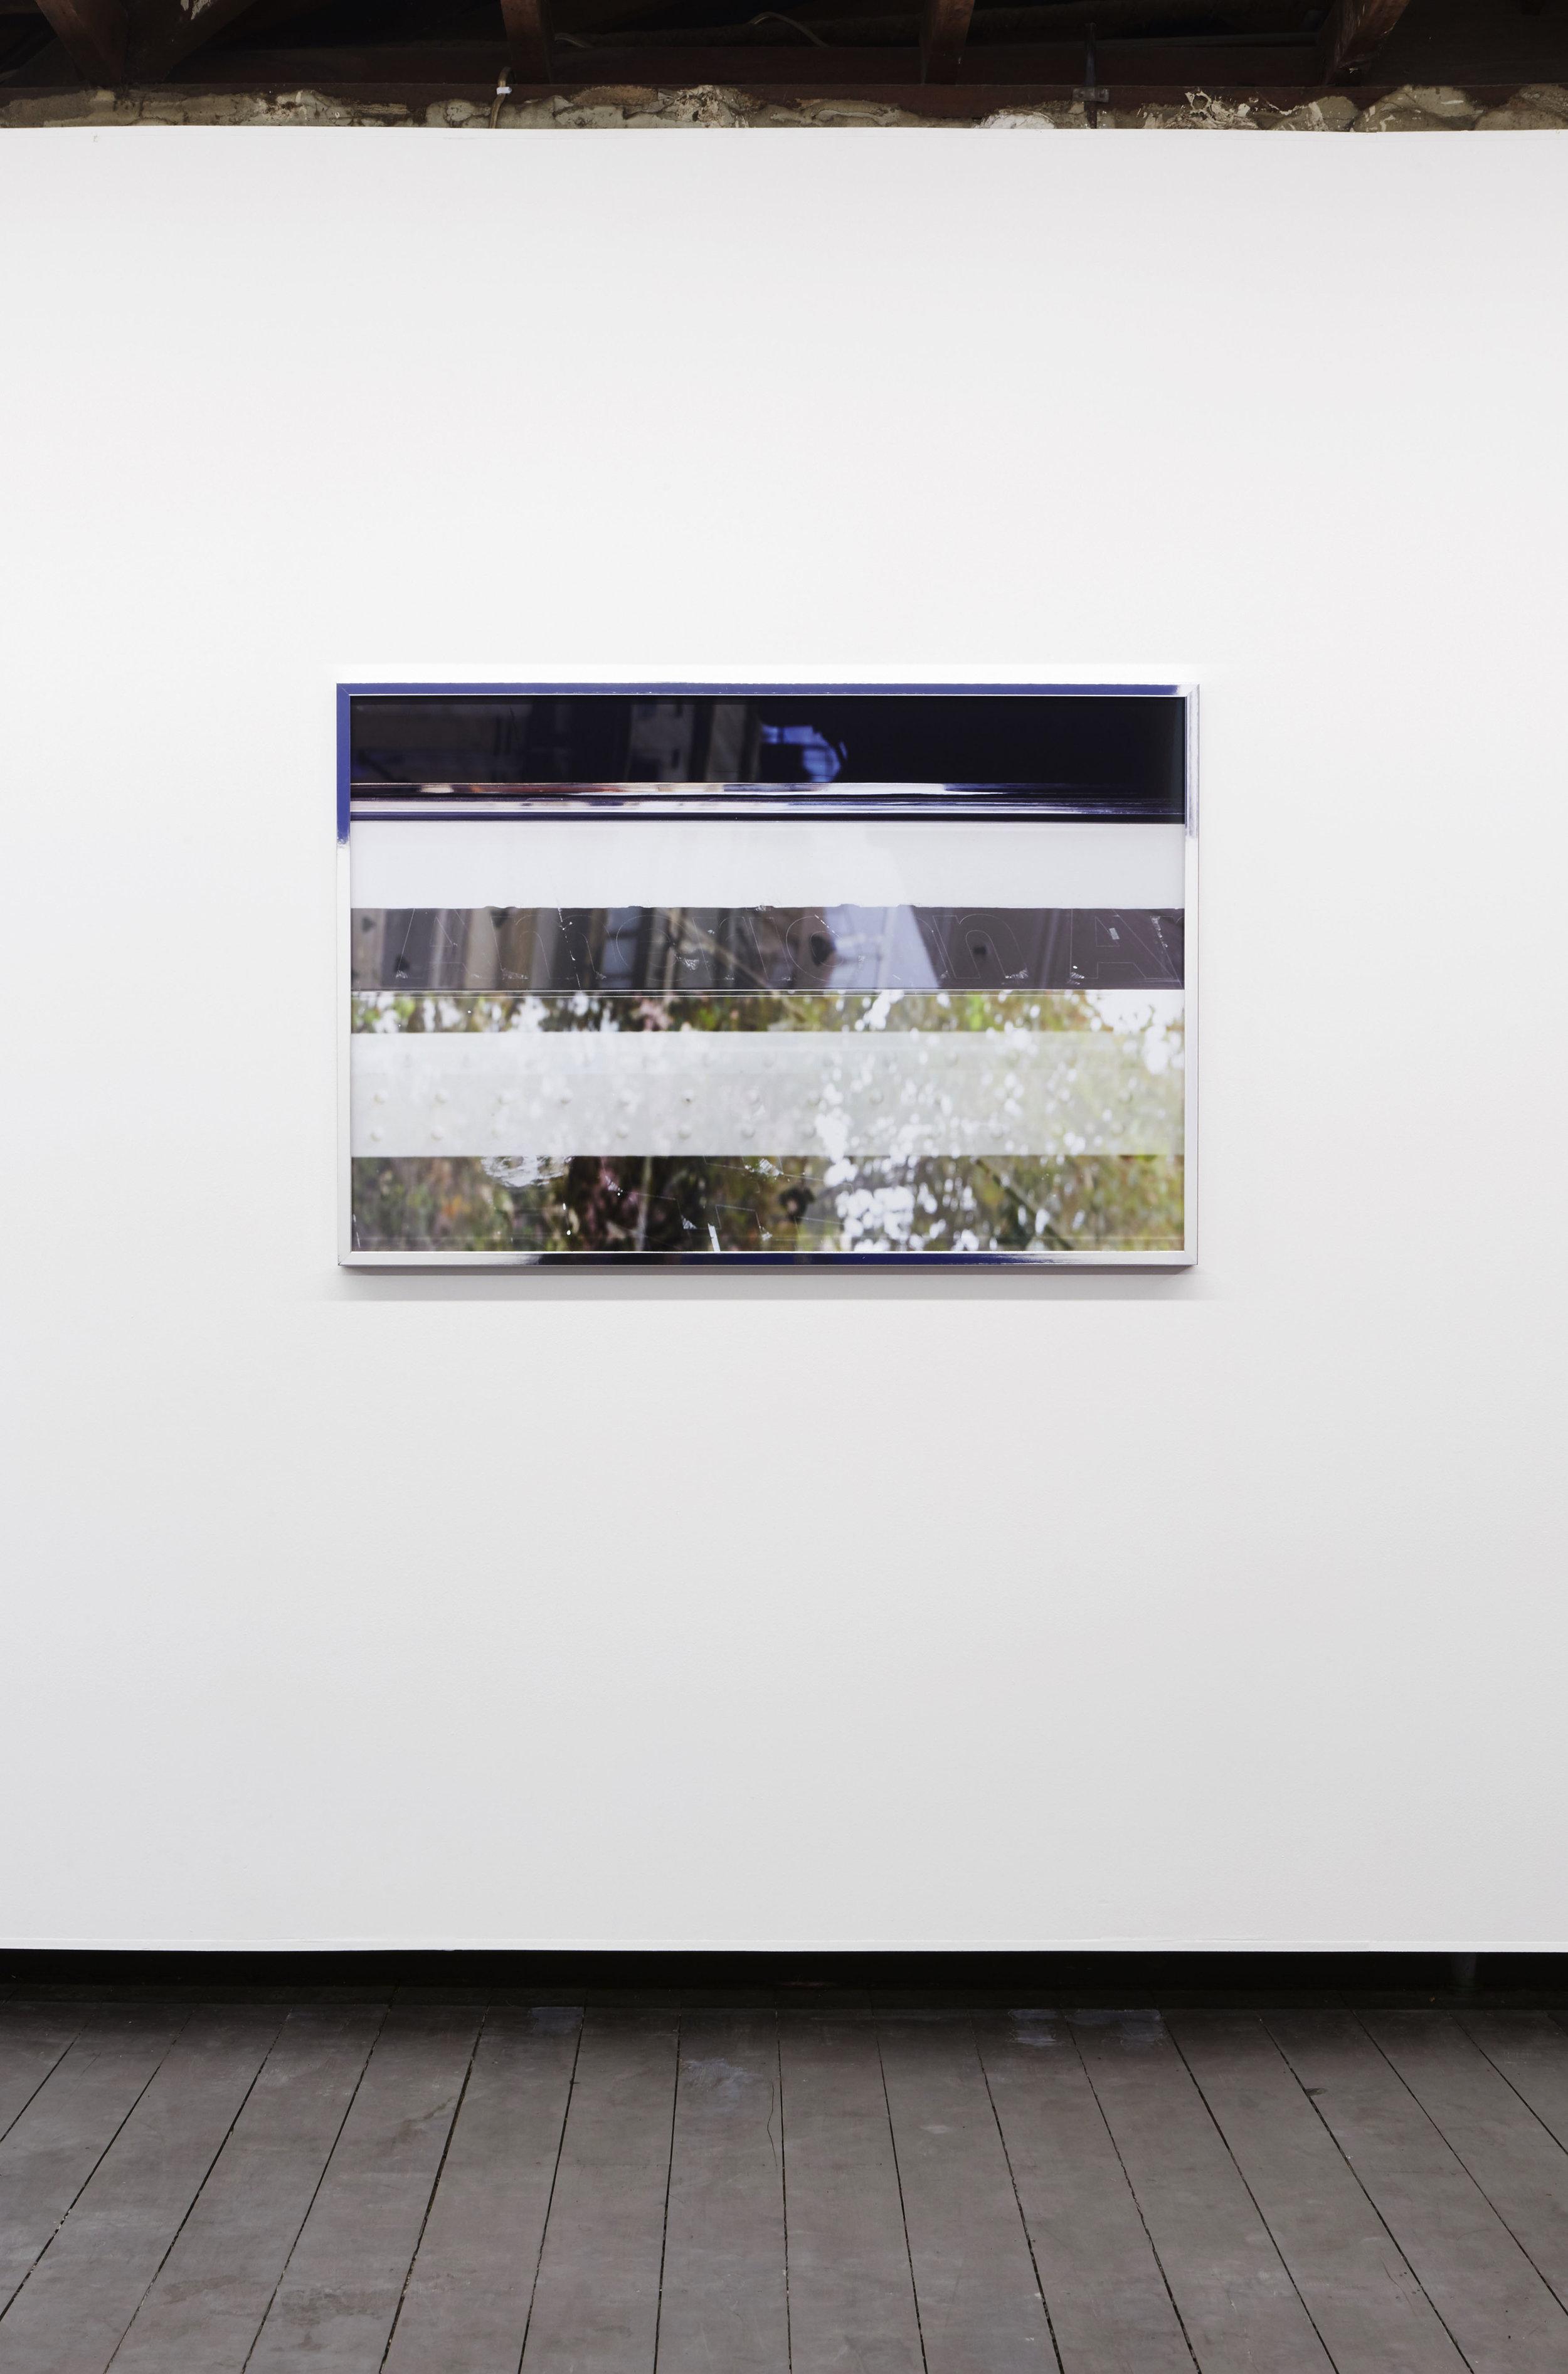 American Apparition , 2017, digital C-type print on metallic gloss, framed, 123 x 83 cm, installation view,  Coconut Republic , Firstdraft, Sydney. Photography: Jessica Maurer. Photo: Zan Wimberley. Copyright JD Reforma